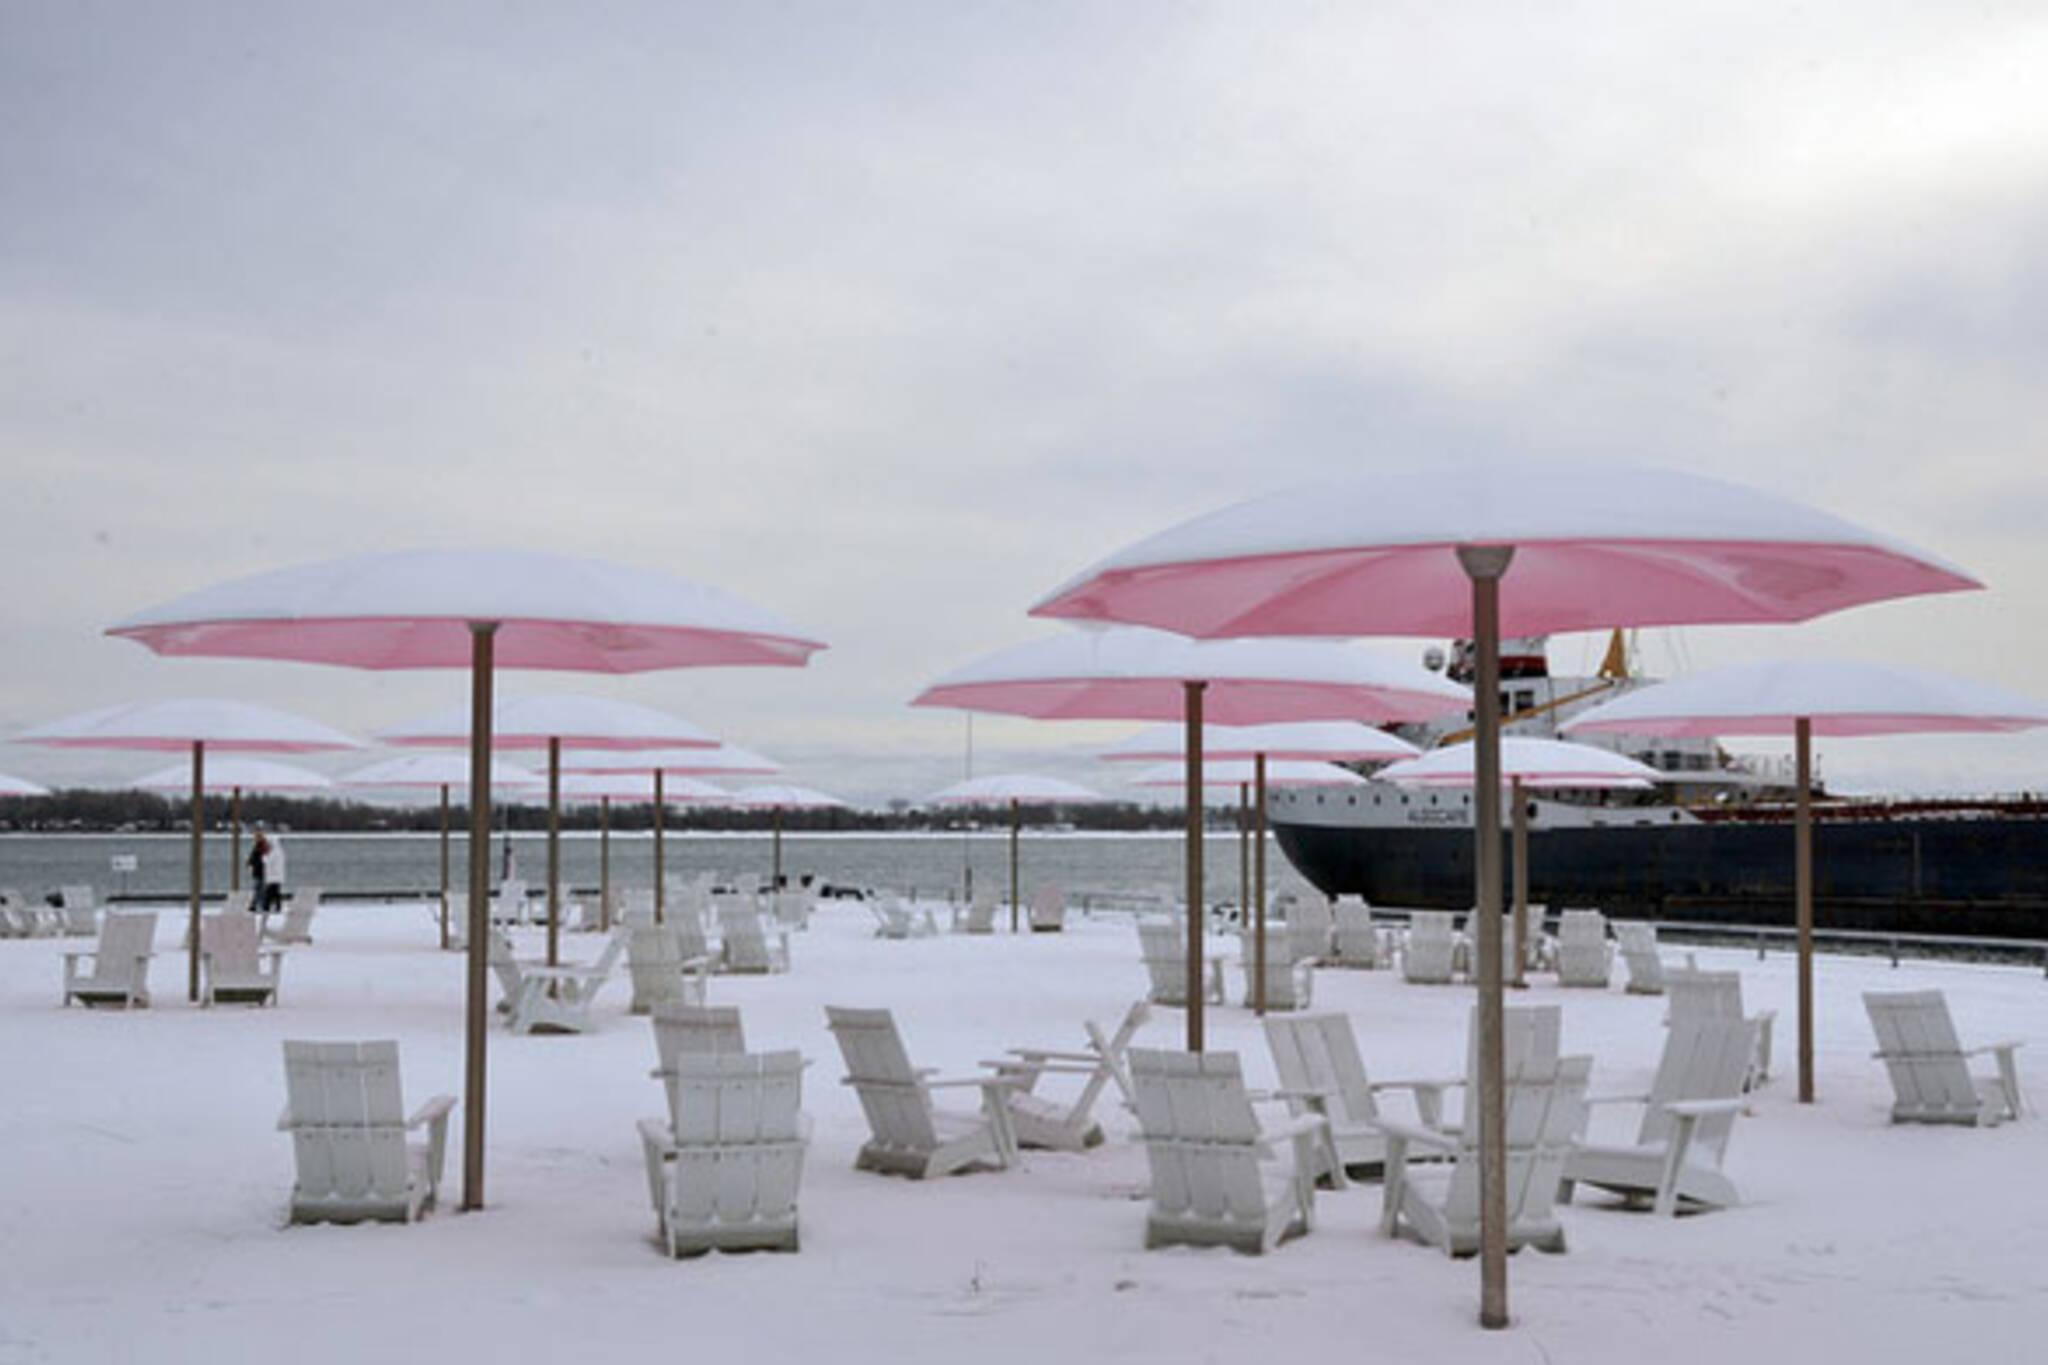 Snow Umbrellas